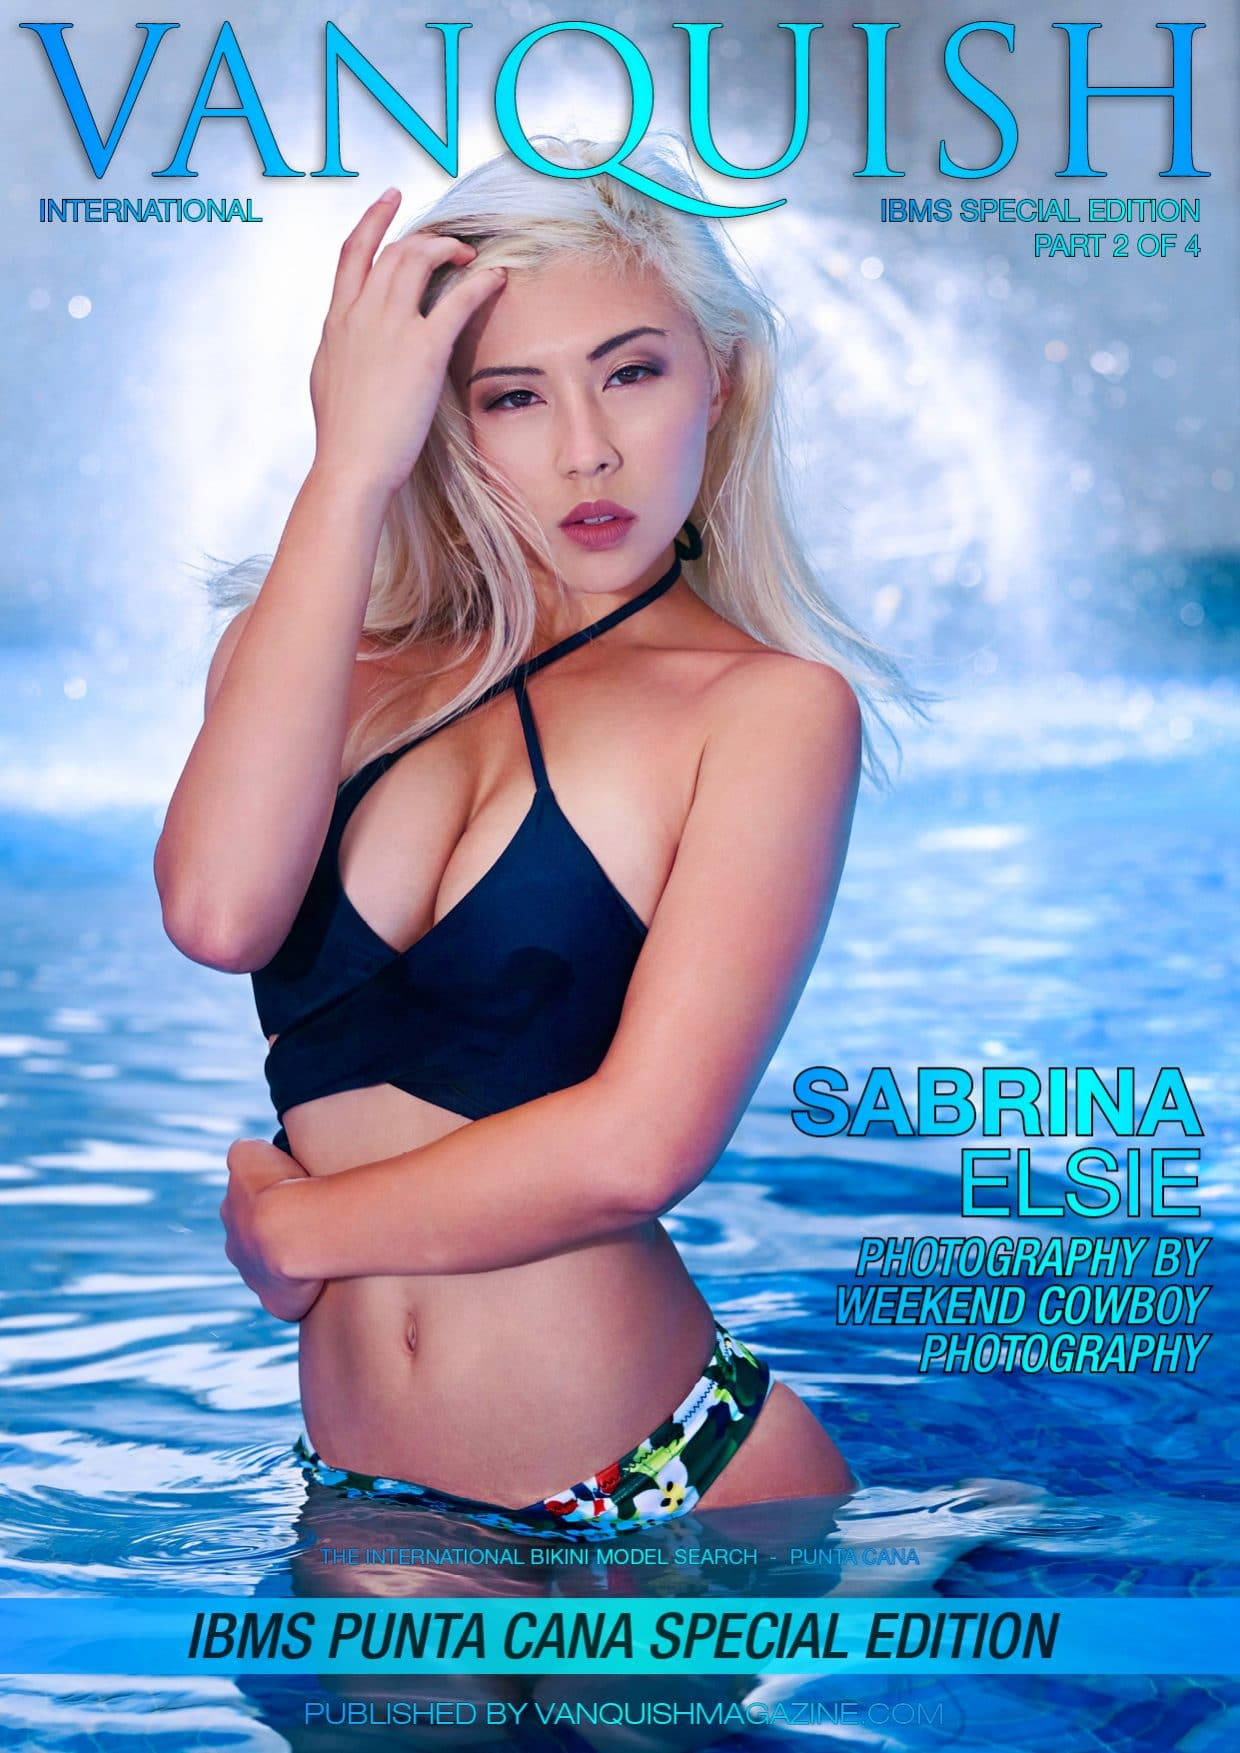 Vanquish Magazine - IBMS Punta Cana - Part 2 - Sabrina Elsie 1